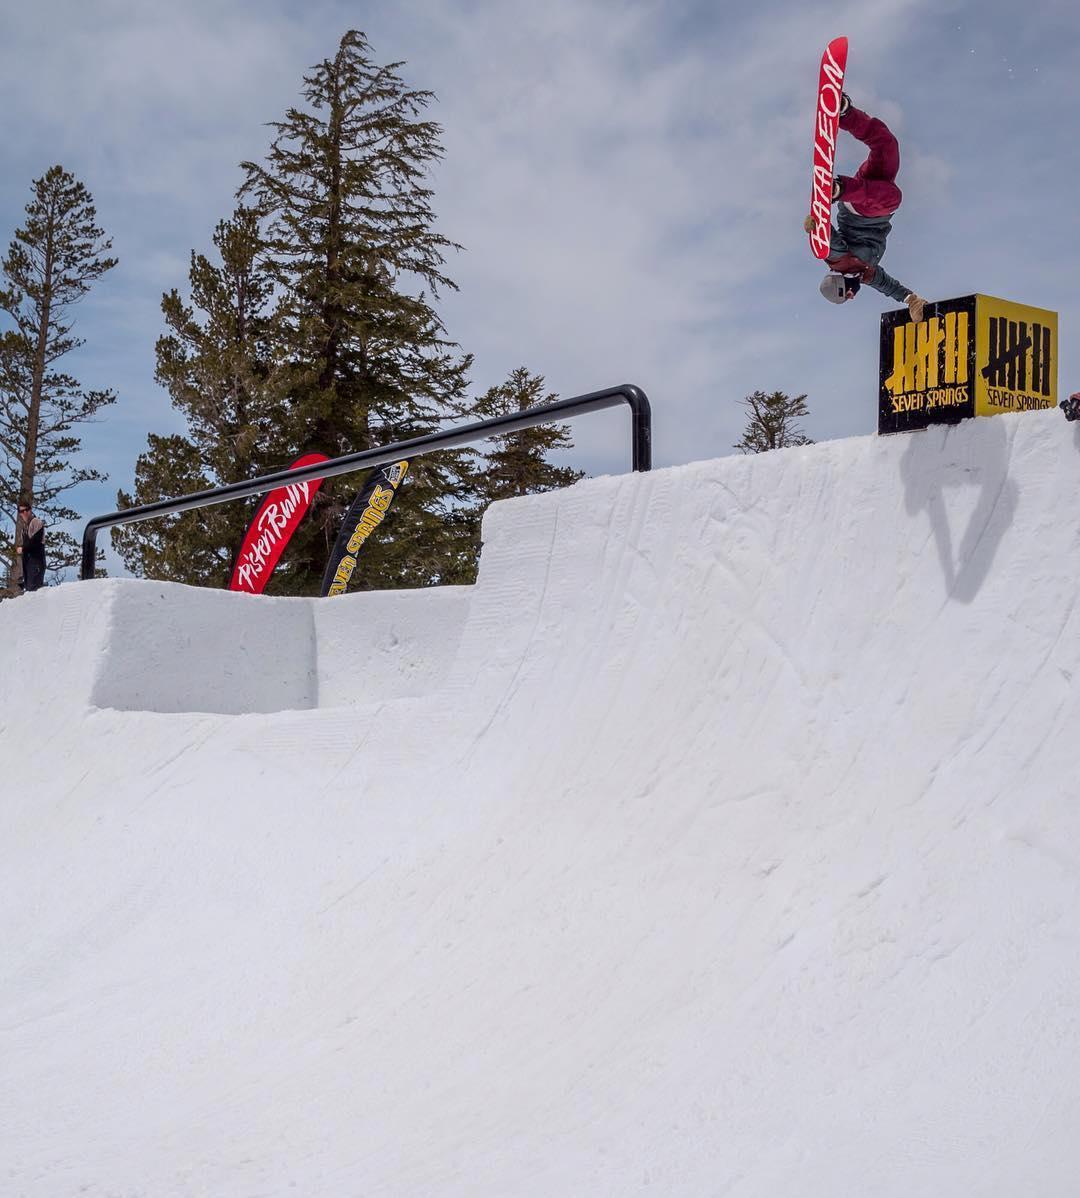 #Repost @shaunmurphy413 ・・・ #superpark20 @snowboardermag @snowboardervideo @mammothmountain @mammothunbound @nexentireusa @oakley @oakleysnowboarding @pistenbullyusa  @bataleonsnowboards #BataleonGLOBALWARMER